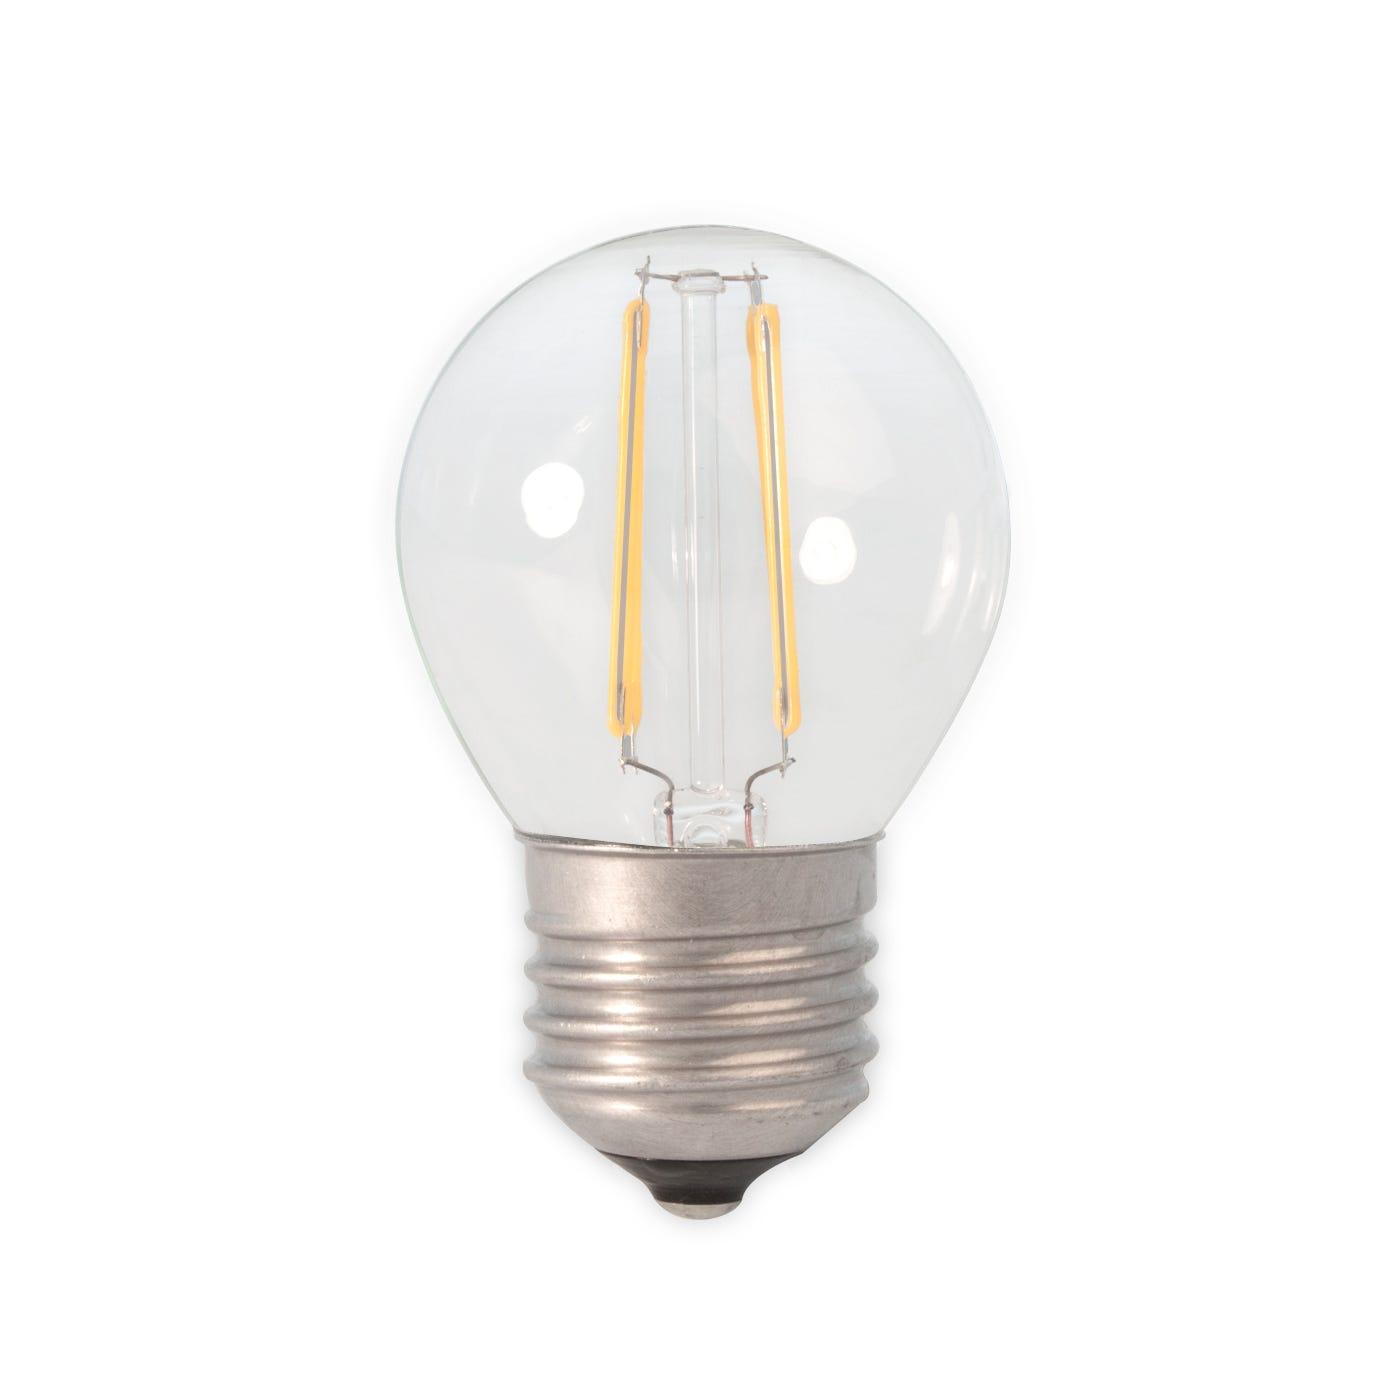 Ball LED E27 Filament Bulb 3.5W